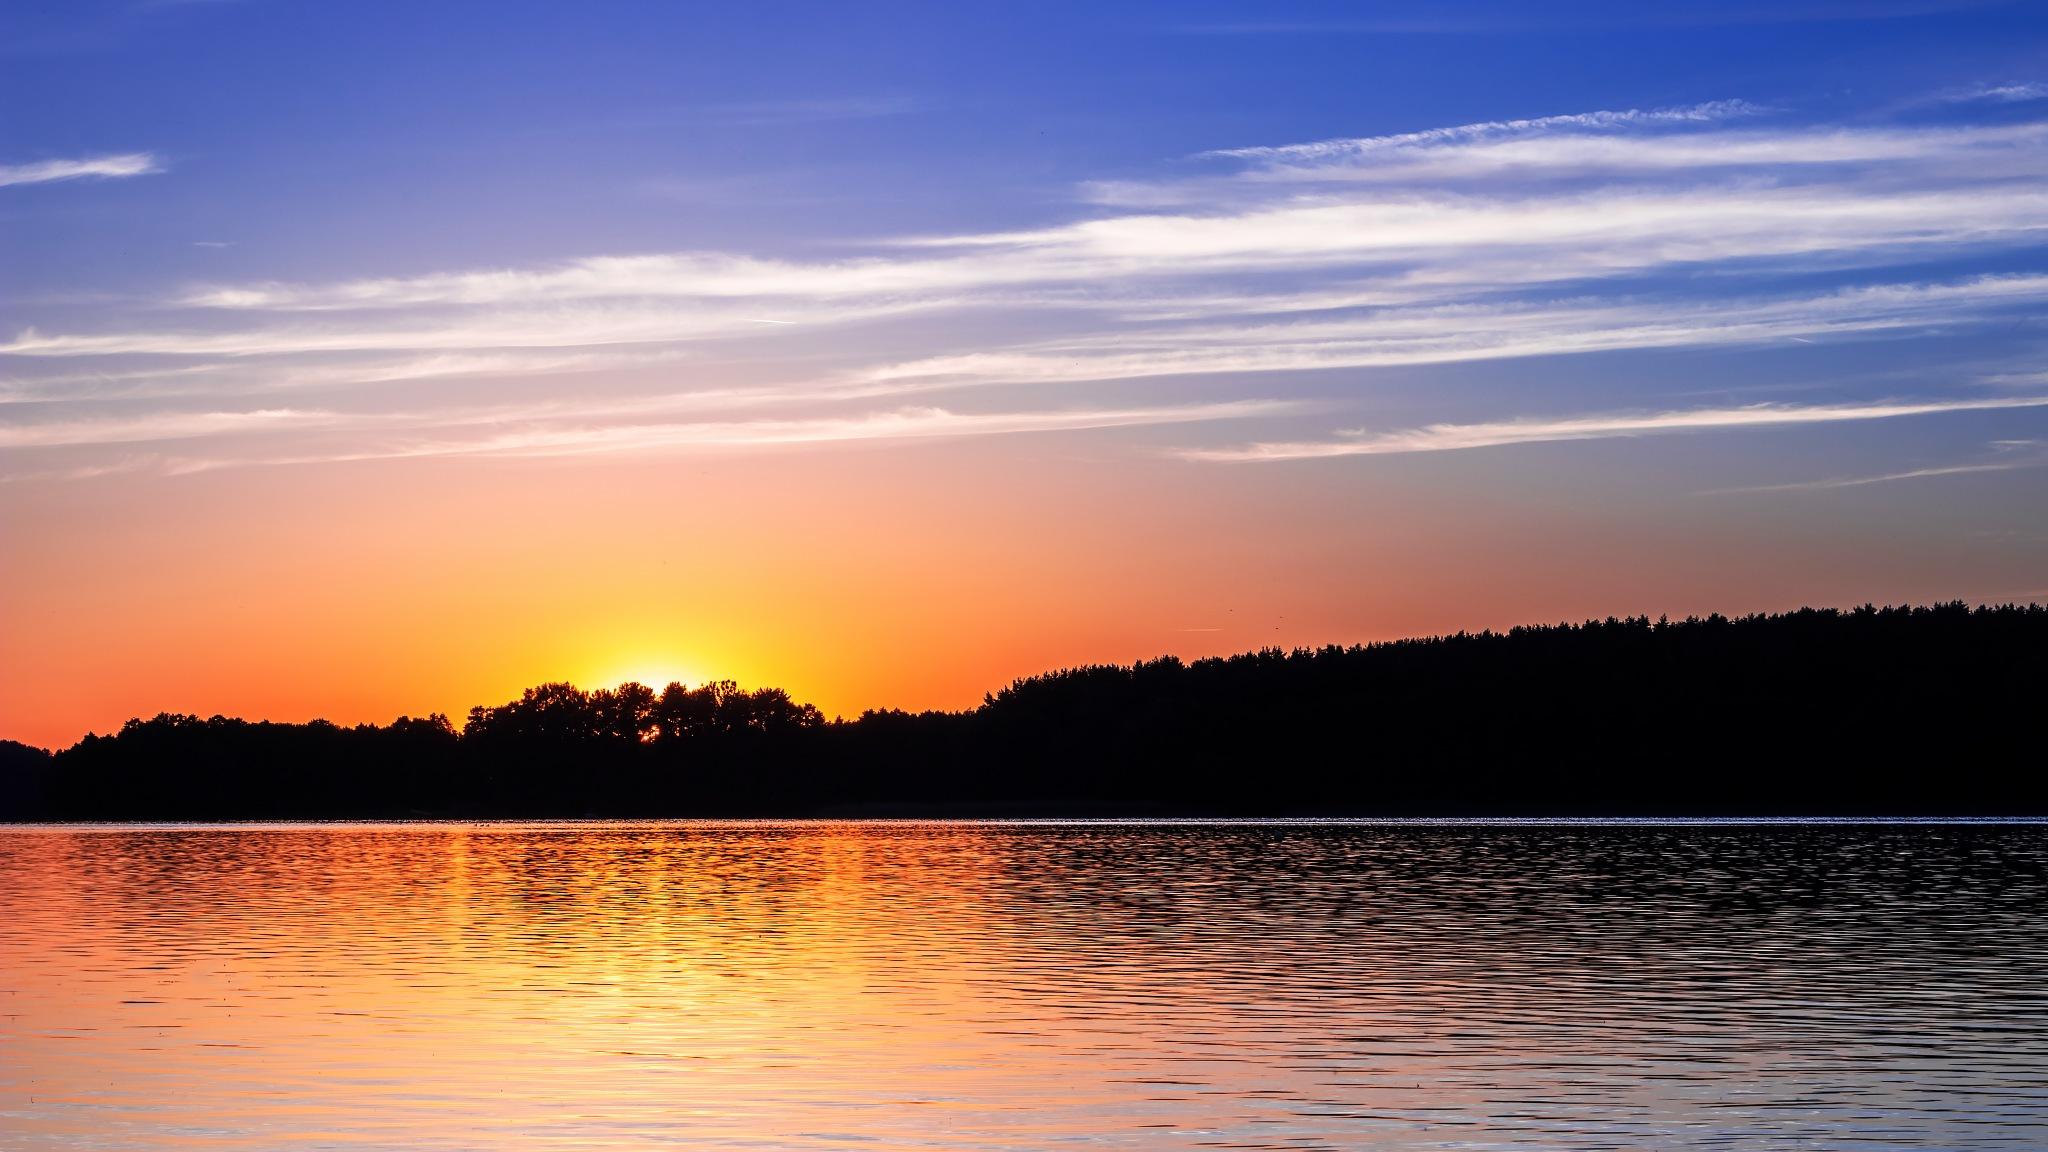 sunset by Paweł